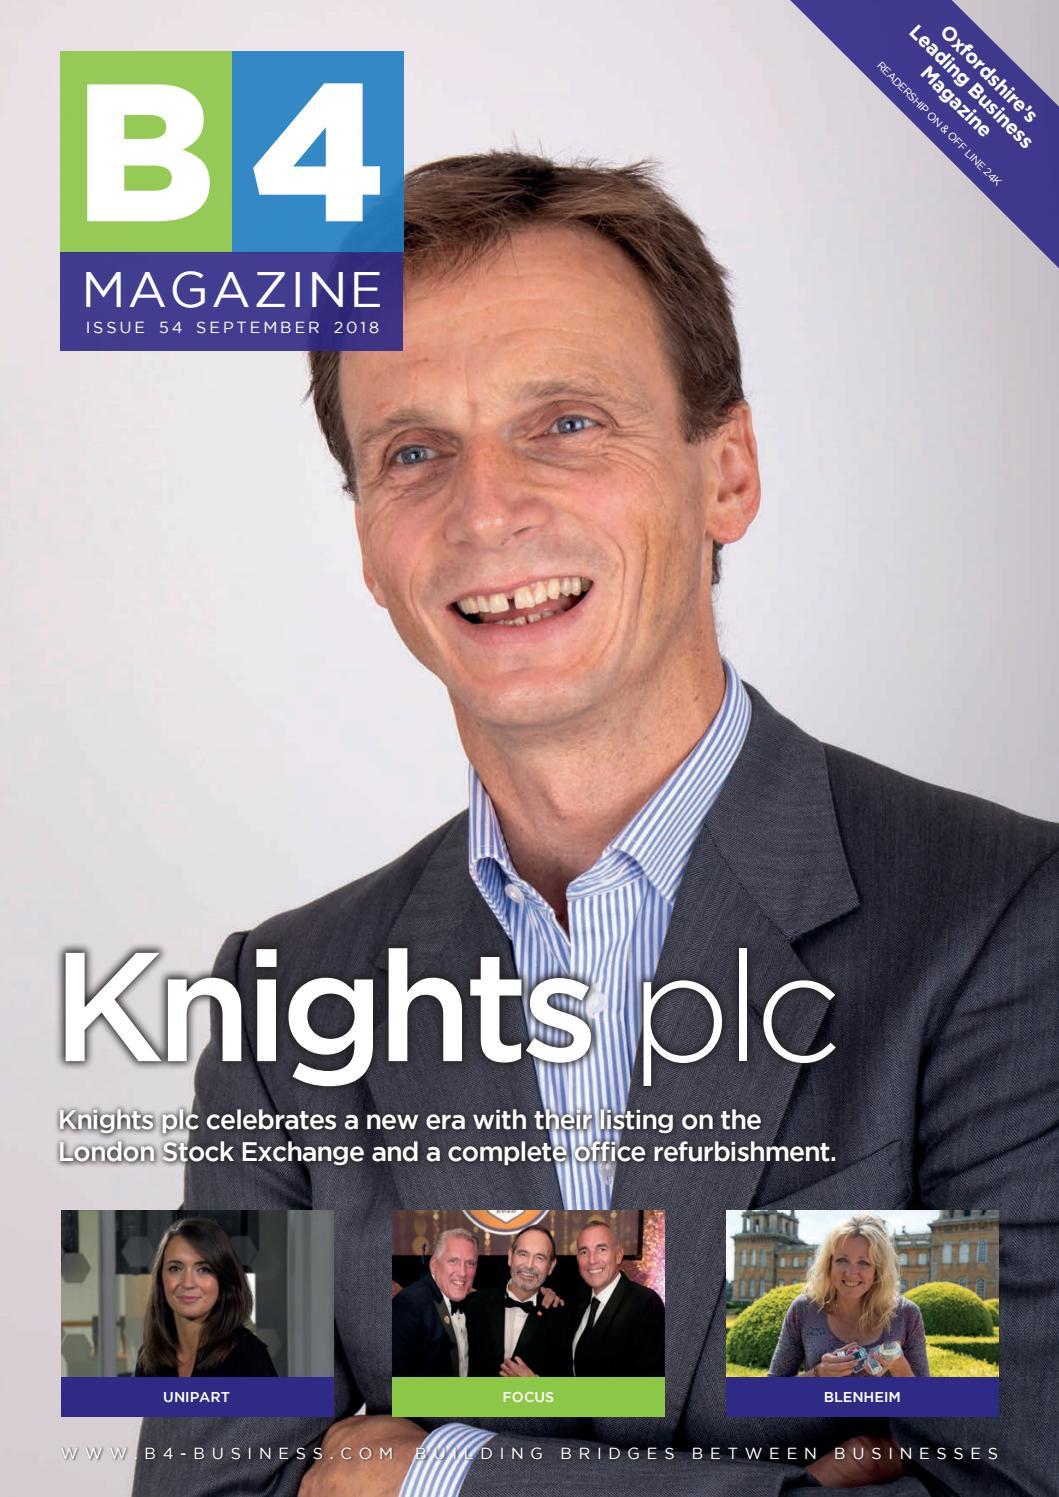 B4 Magazine Issue 54 - Knights Edition by B4 Magazine - issuu 1b1acde2718